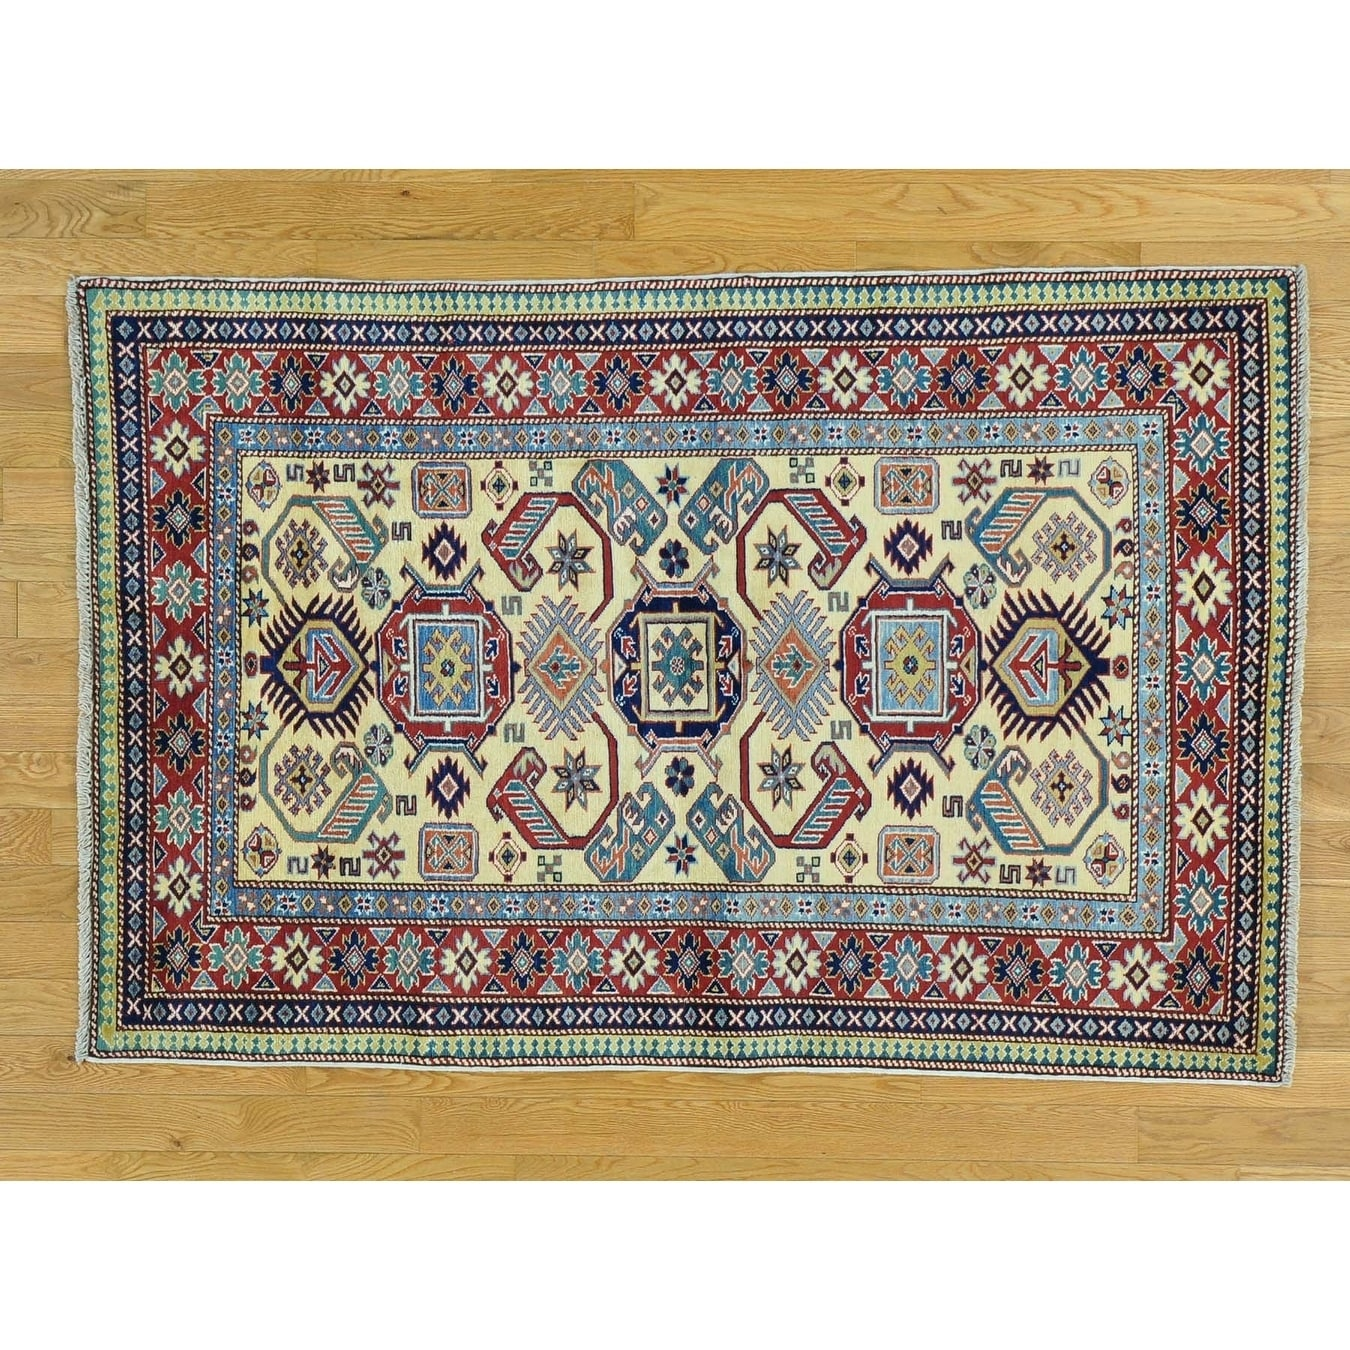 Hand Knotted Beige Kazak with Wool Oriental Rug - 310 x 58